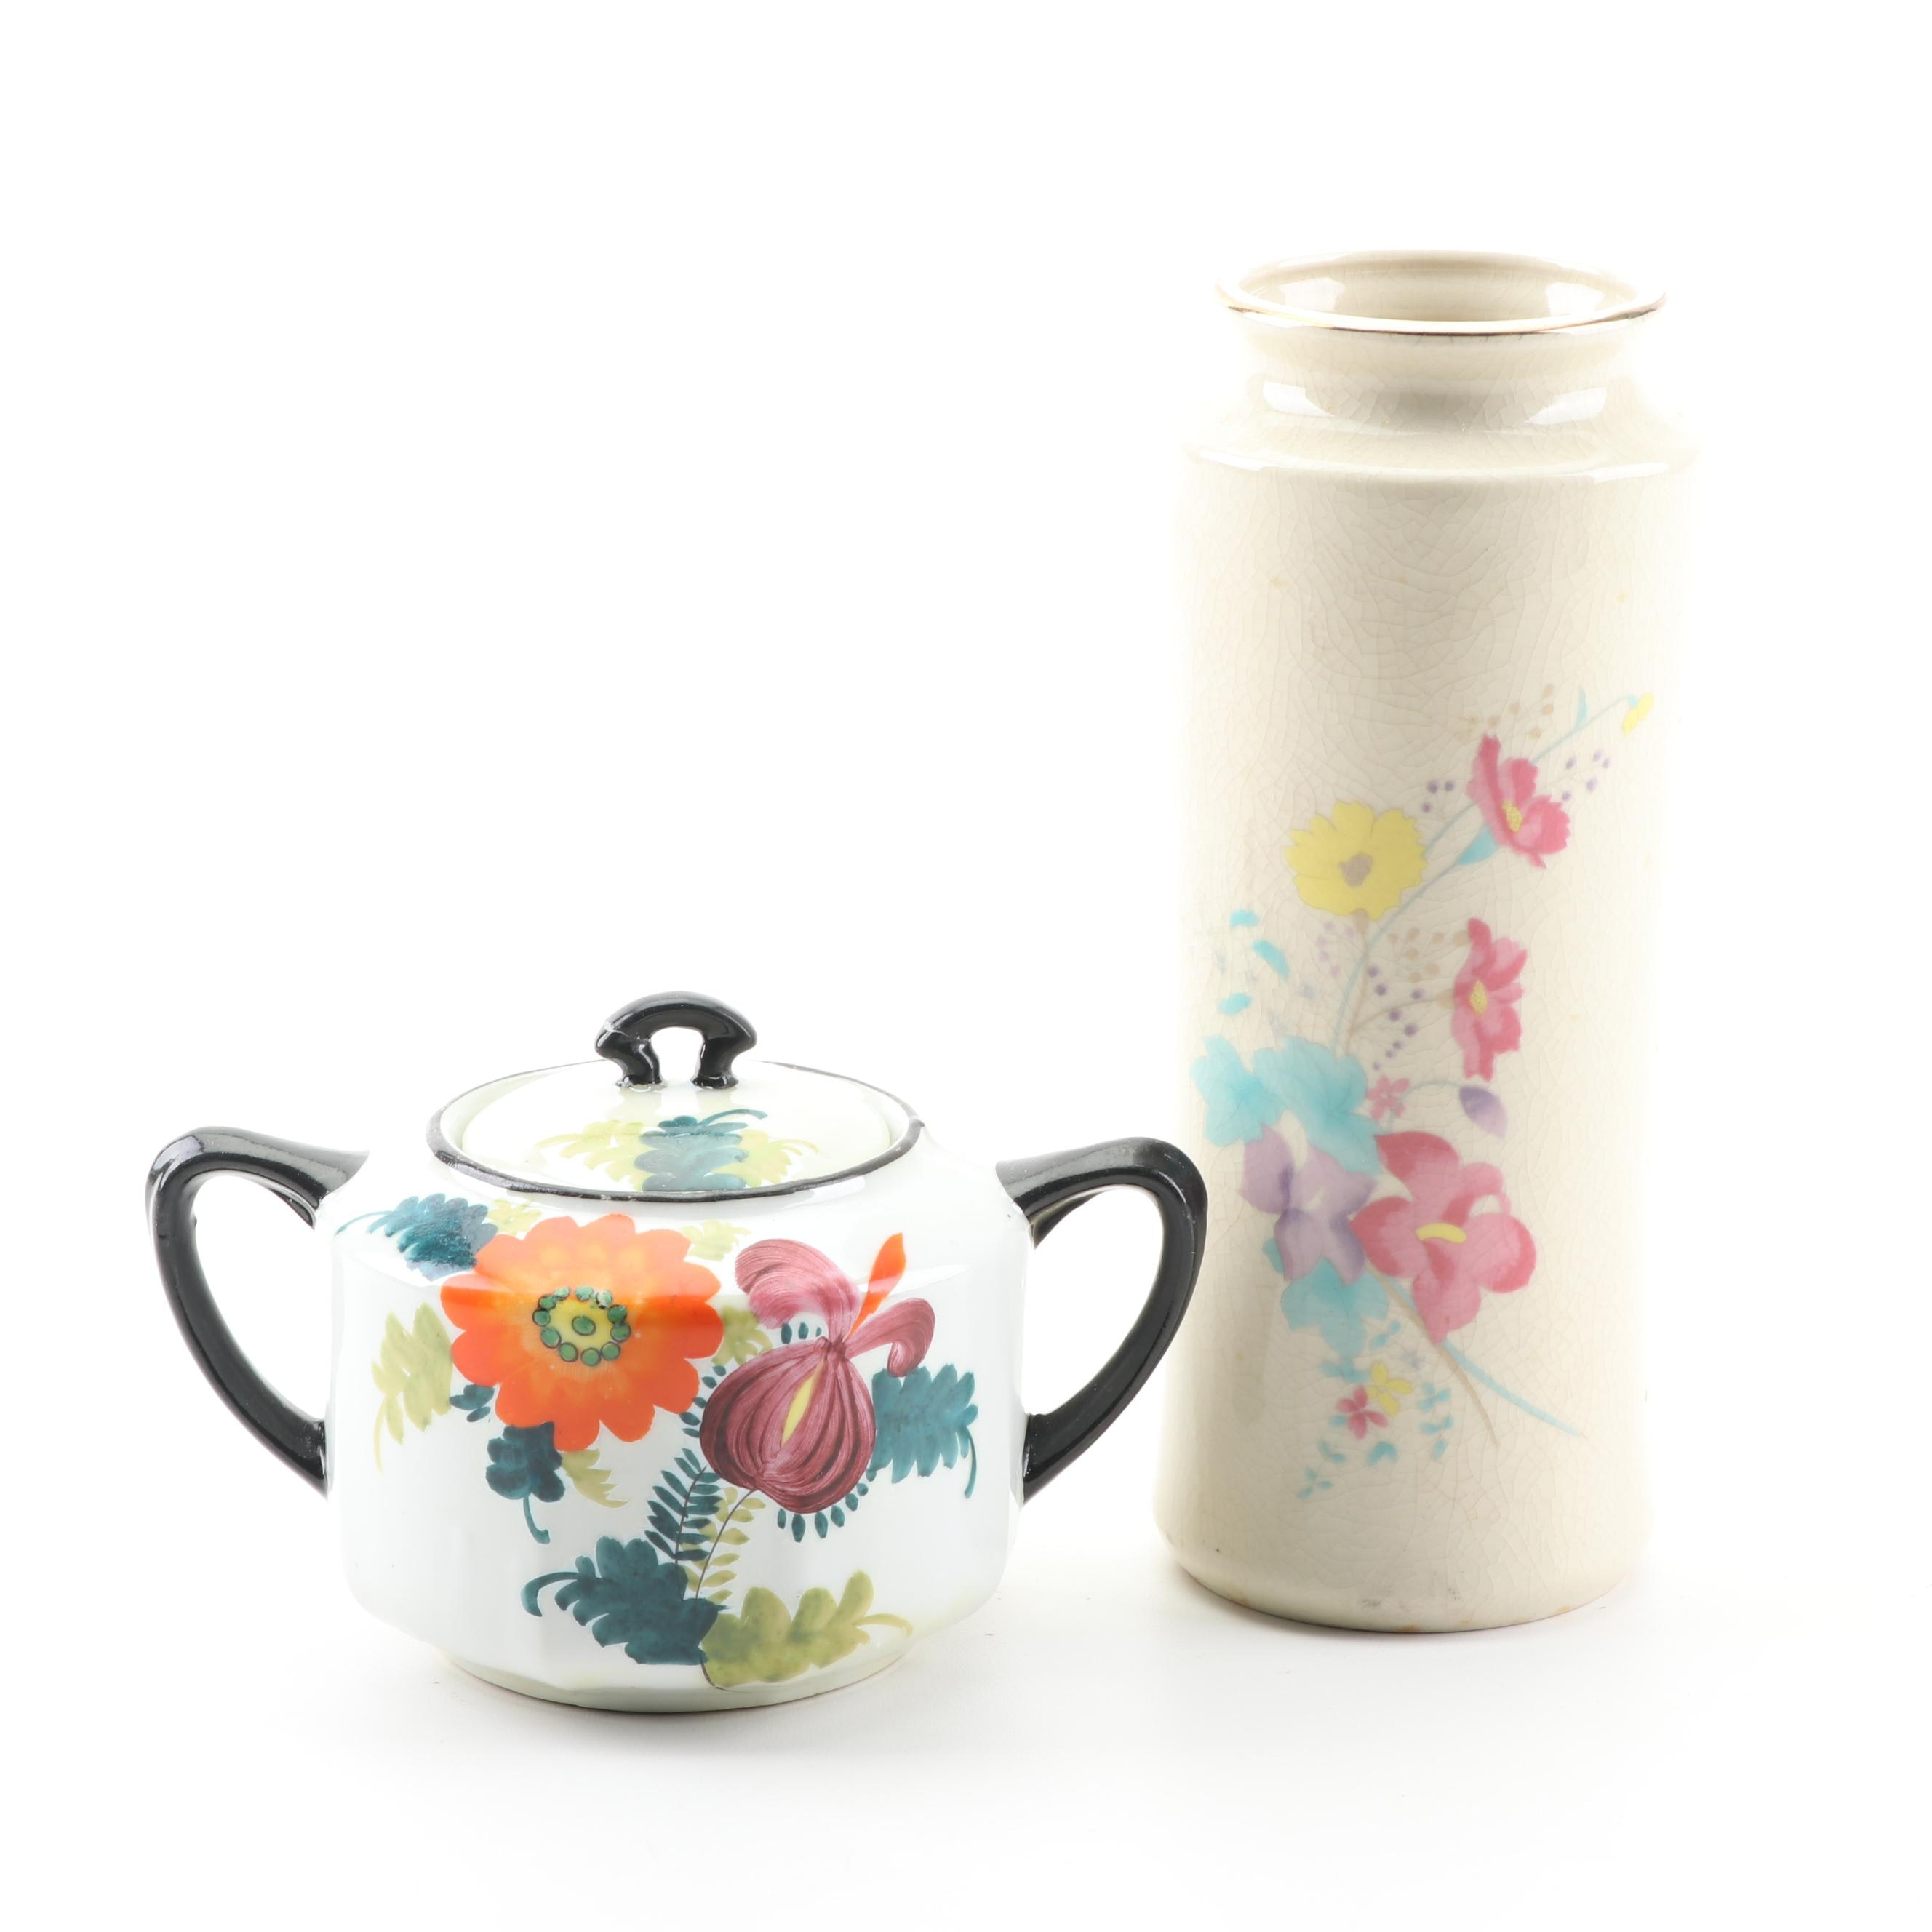 Japanese Hand-Painted Ceramic Vase and Lidded Sugar Bowl